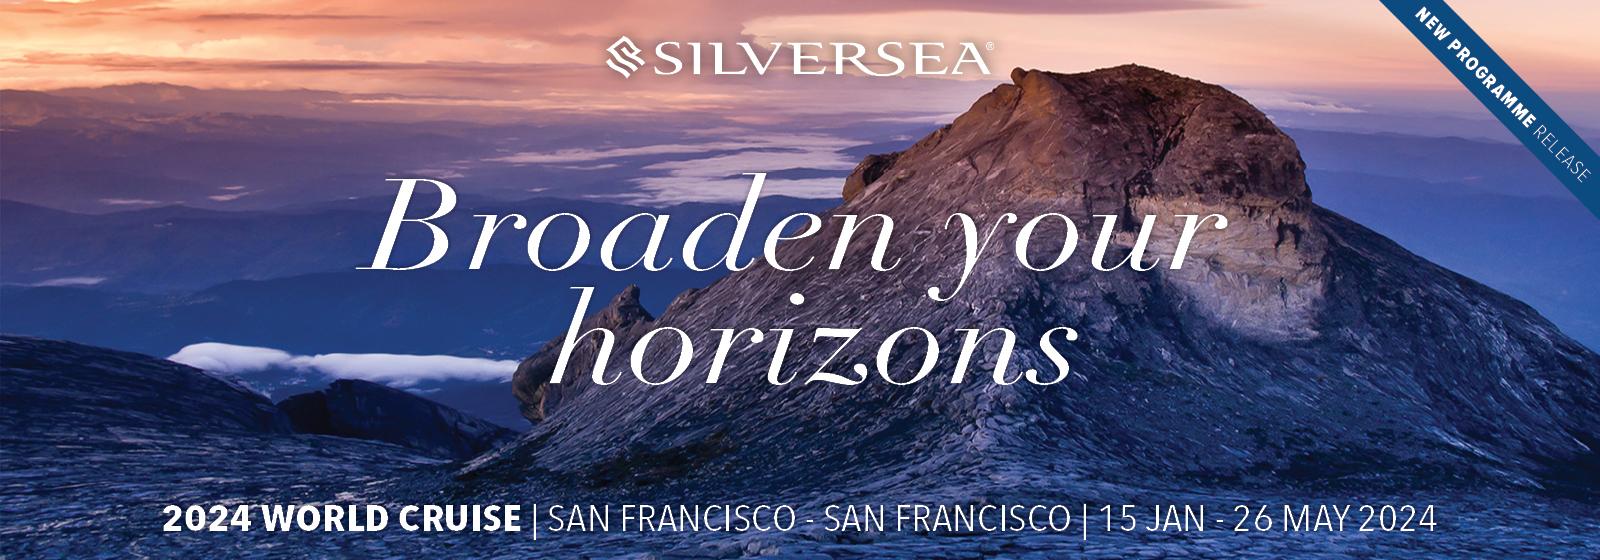 Silversea World Cruise 2024